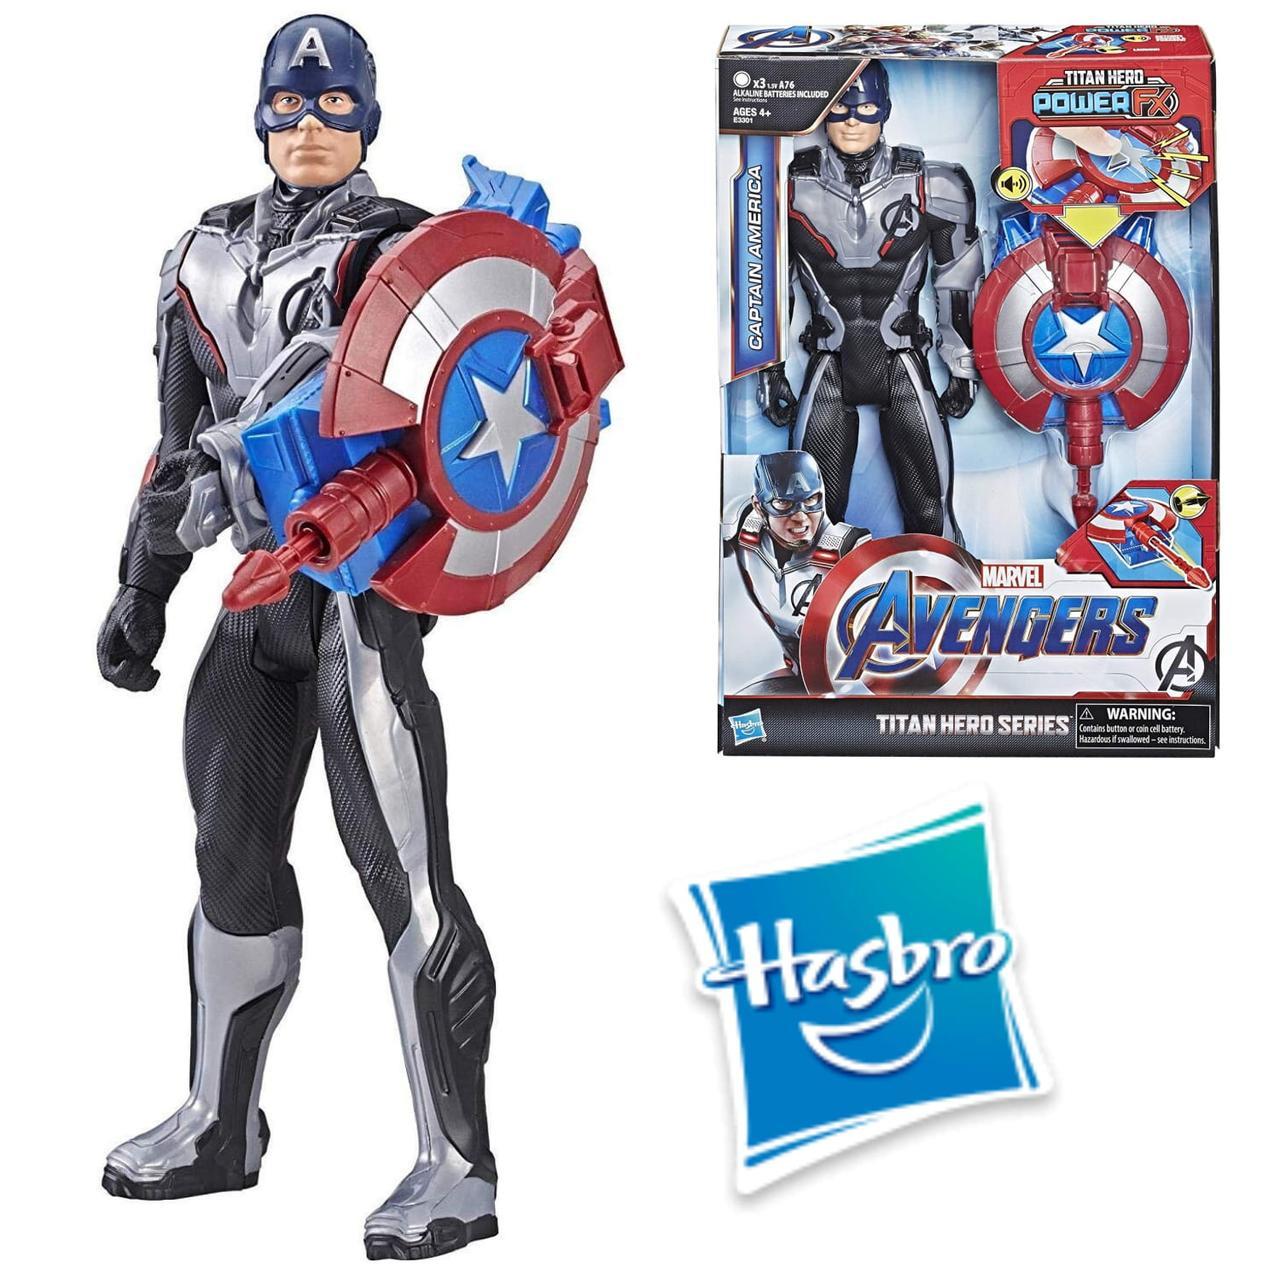 Капитан Америка Марвел со звуковыми эффектами Avengers Marvel Captain America